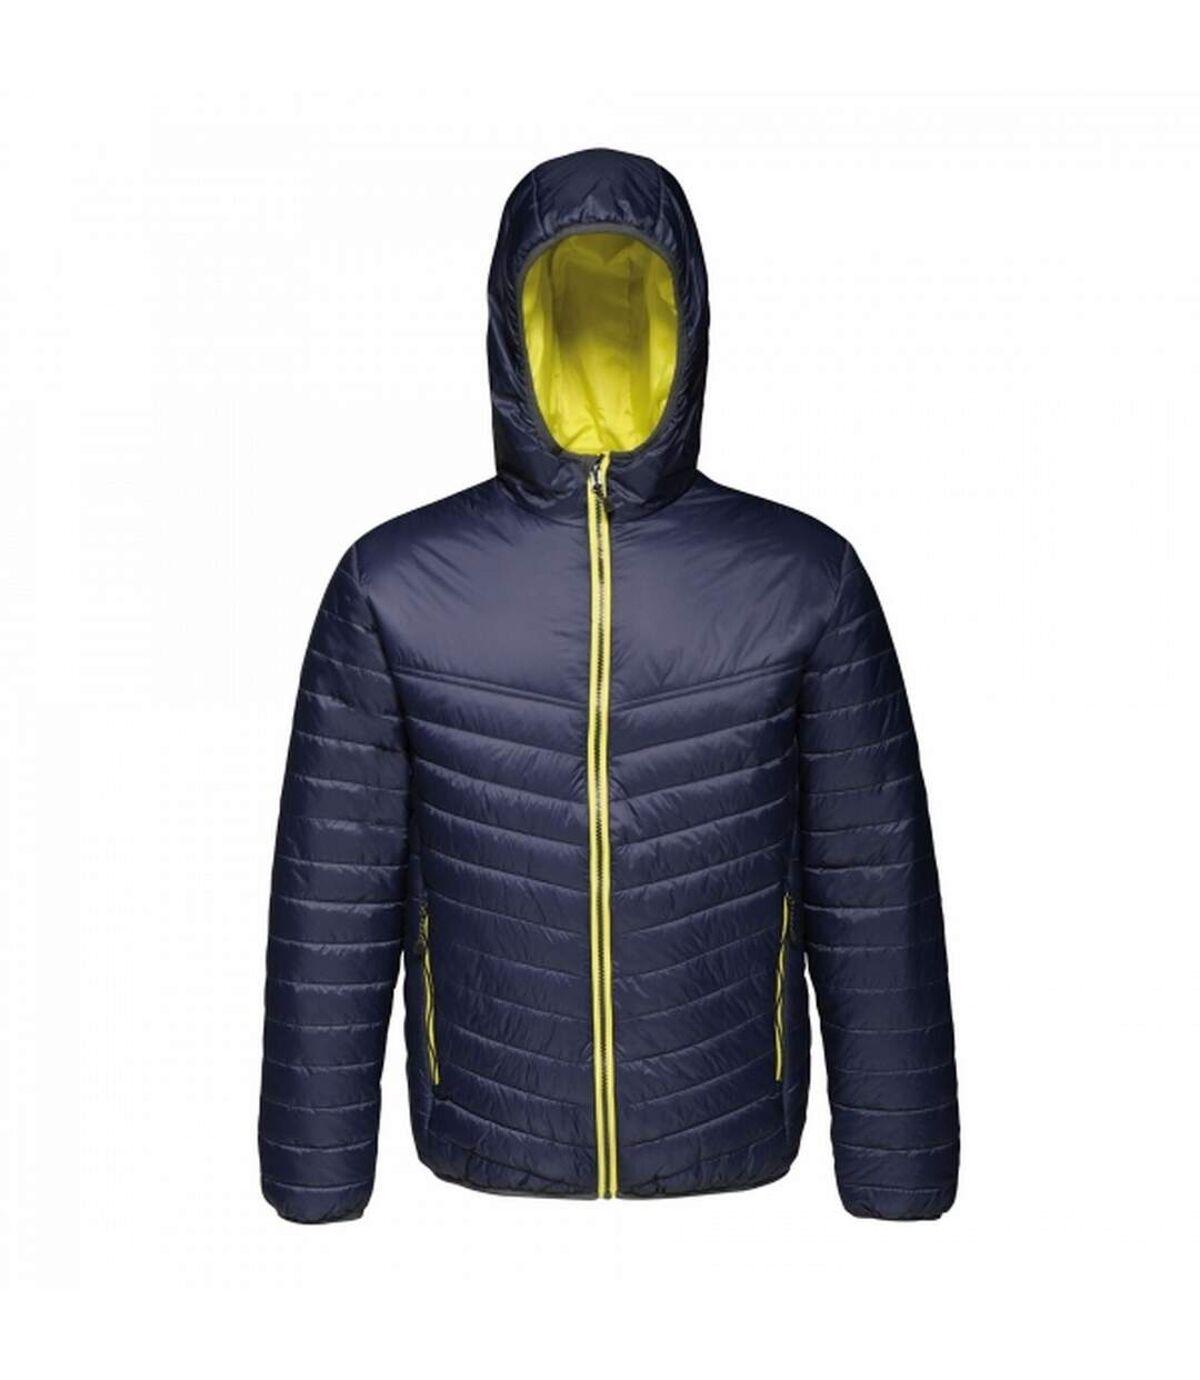 Regatta Mens Acadia II Hooded Jacket (Granite Grey/Pastel Orange) - UTRG3745